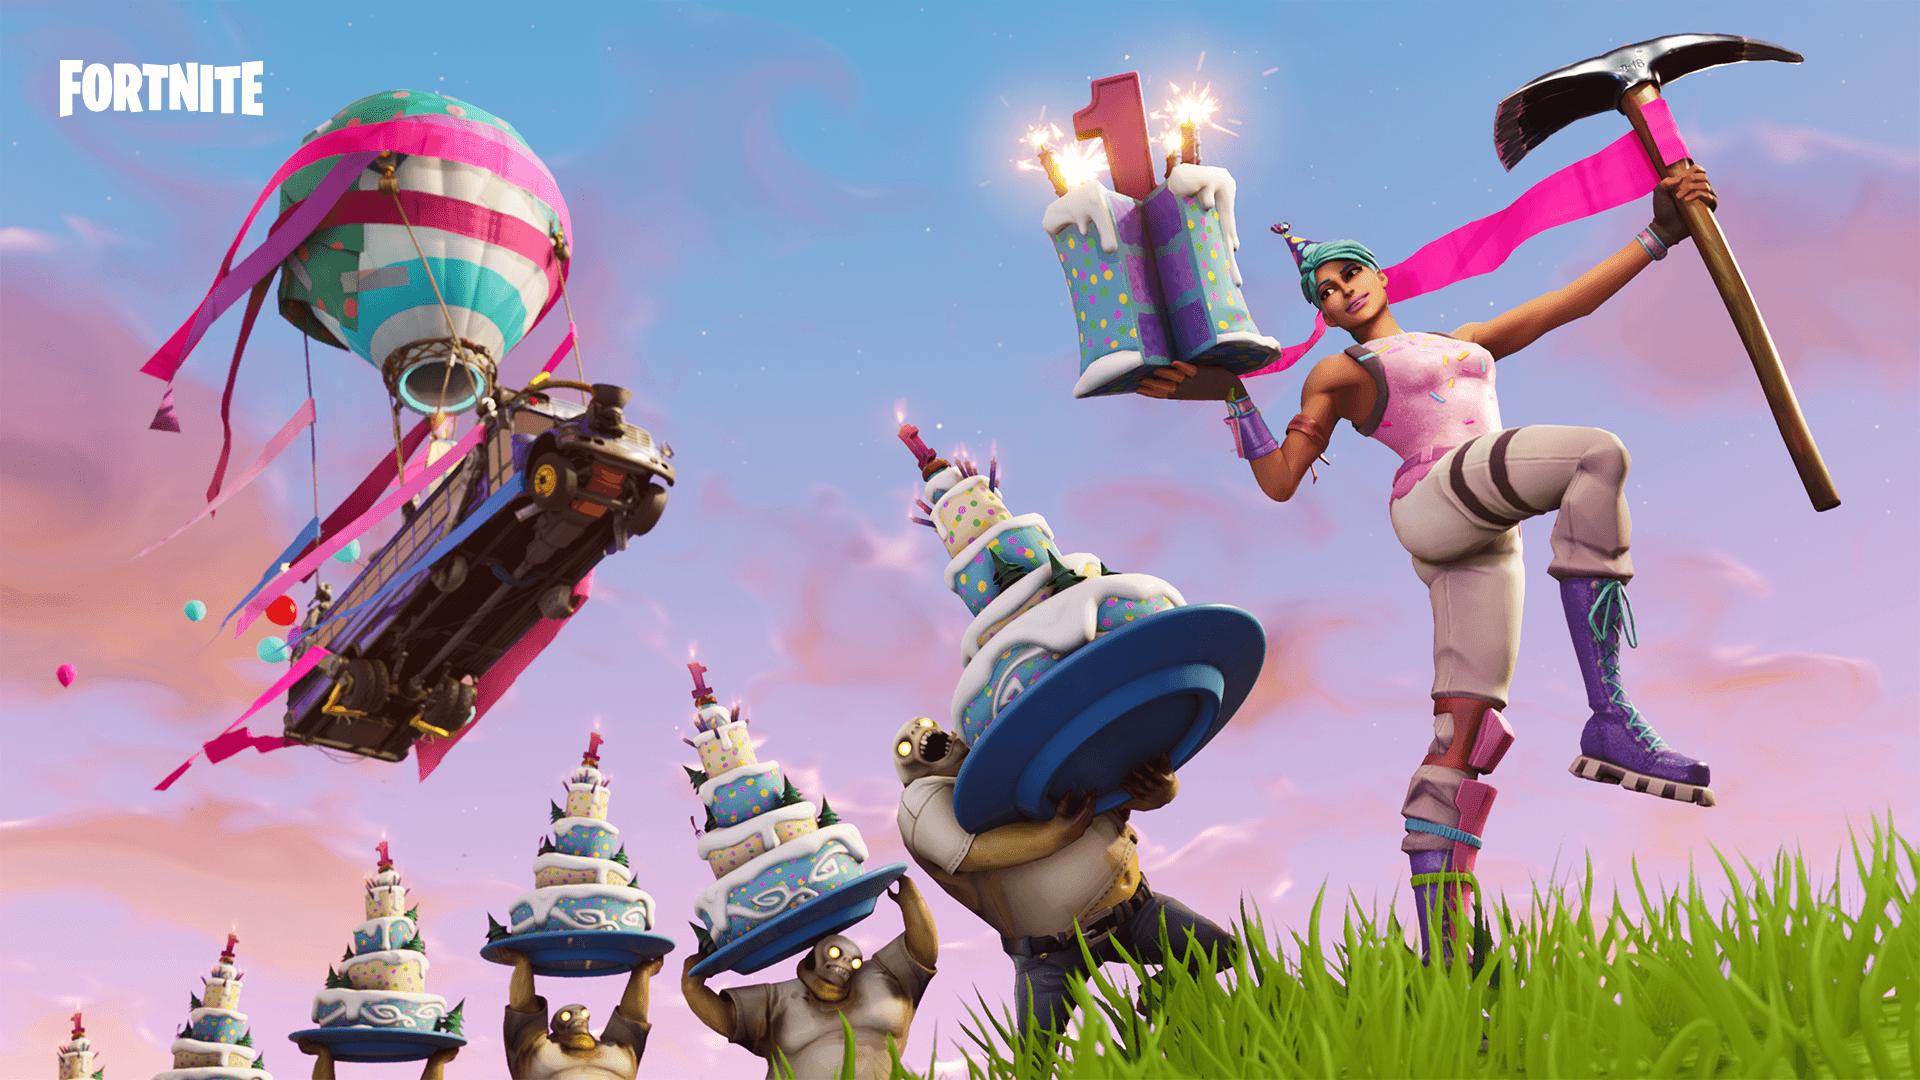 record: פורטנייט חוגג יום הולדת ומביא לנו כמה מתנות cover image